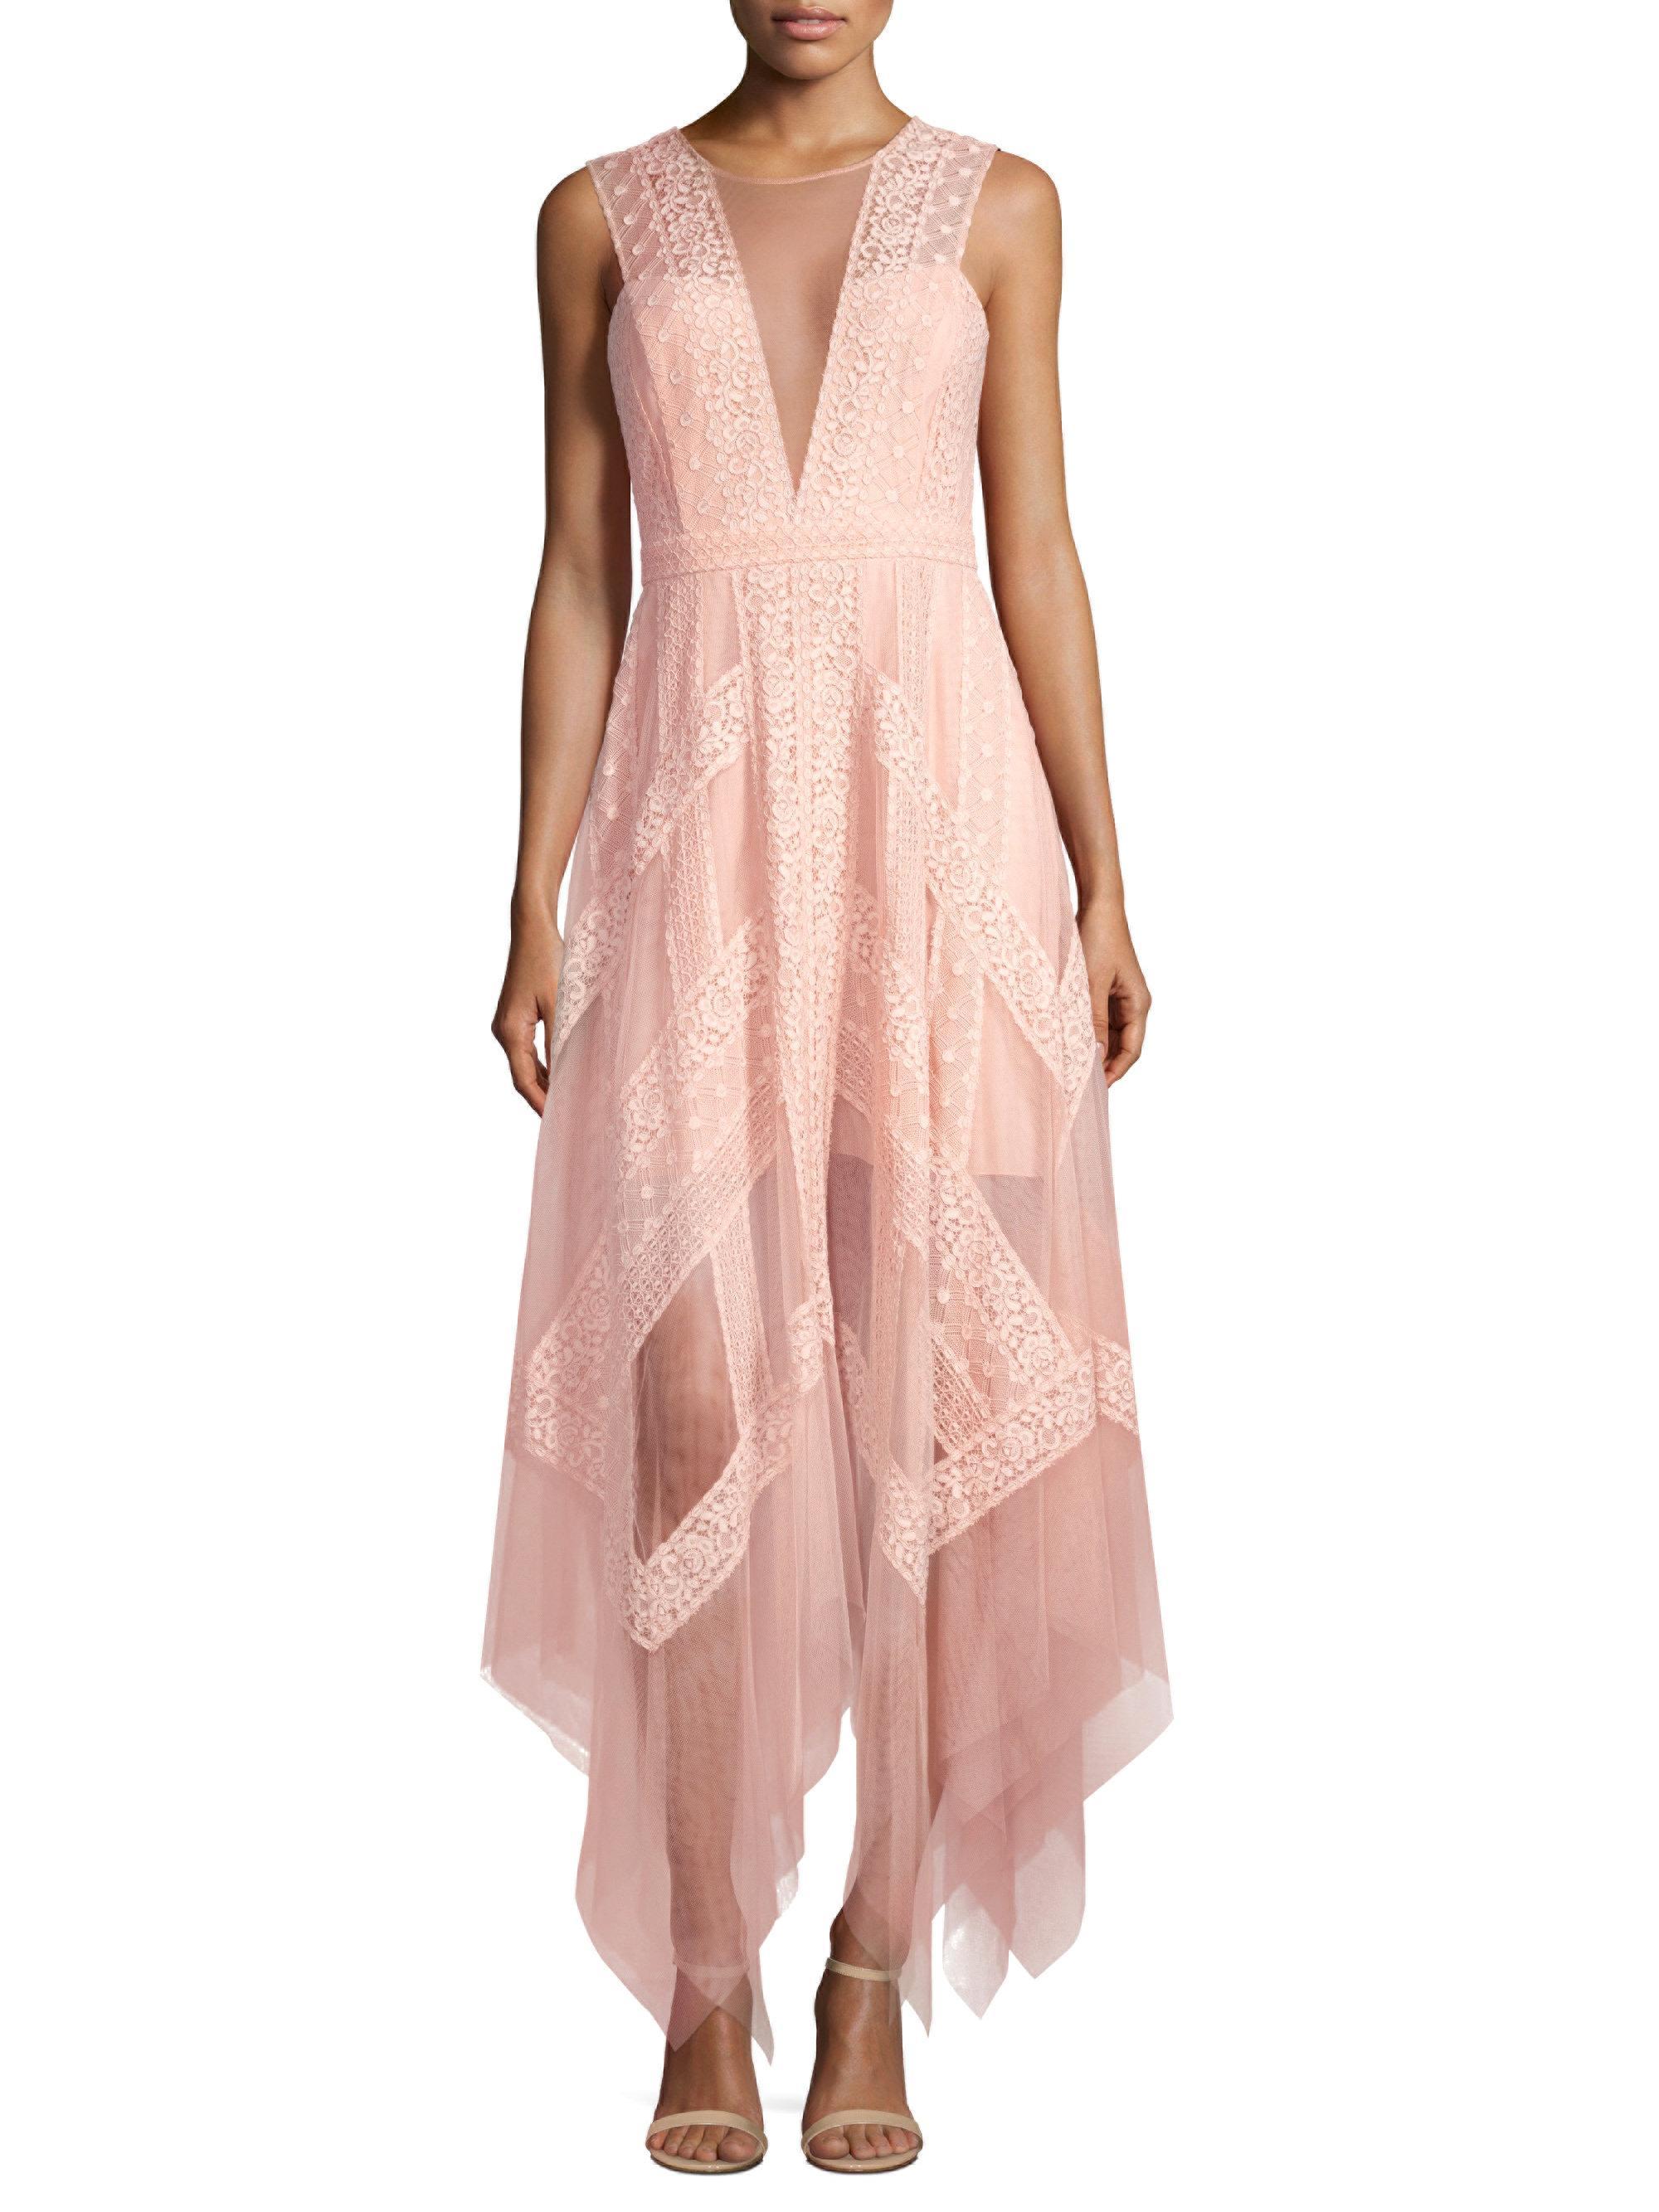 Lyst - Bcbgmaxazria Asymmetrical Lace Dress in Pink